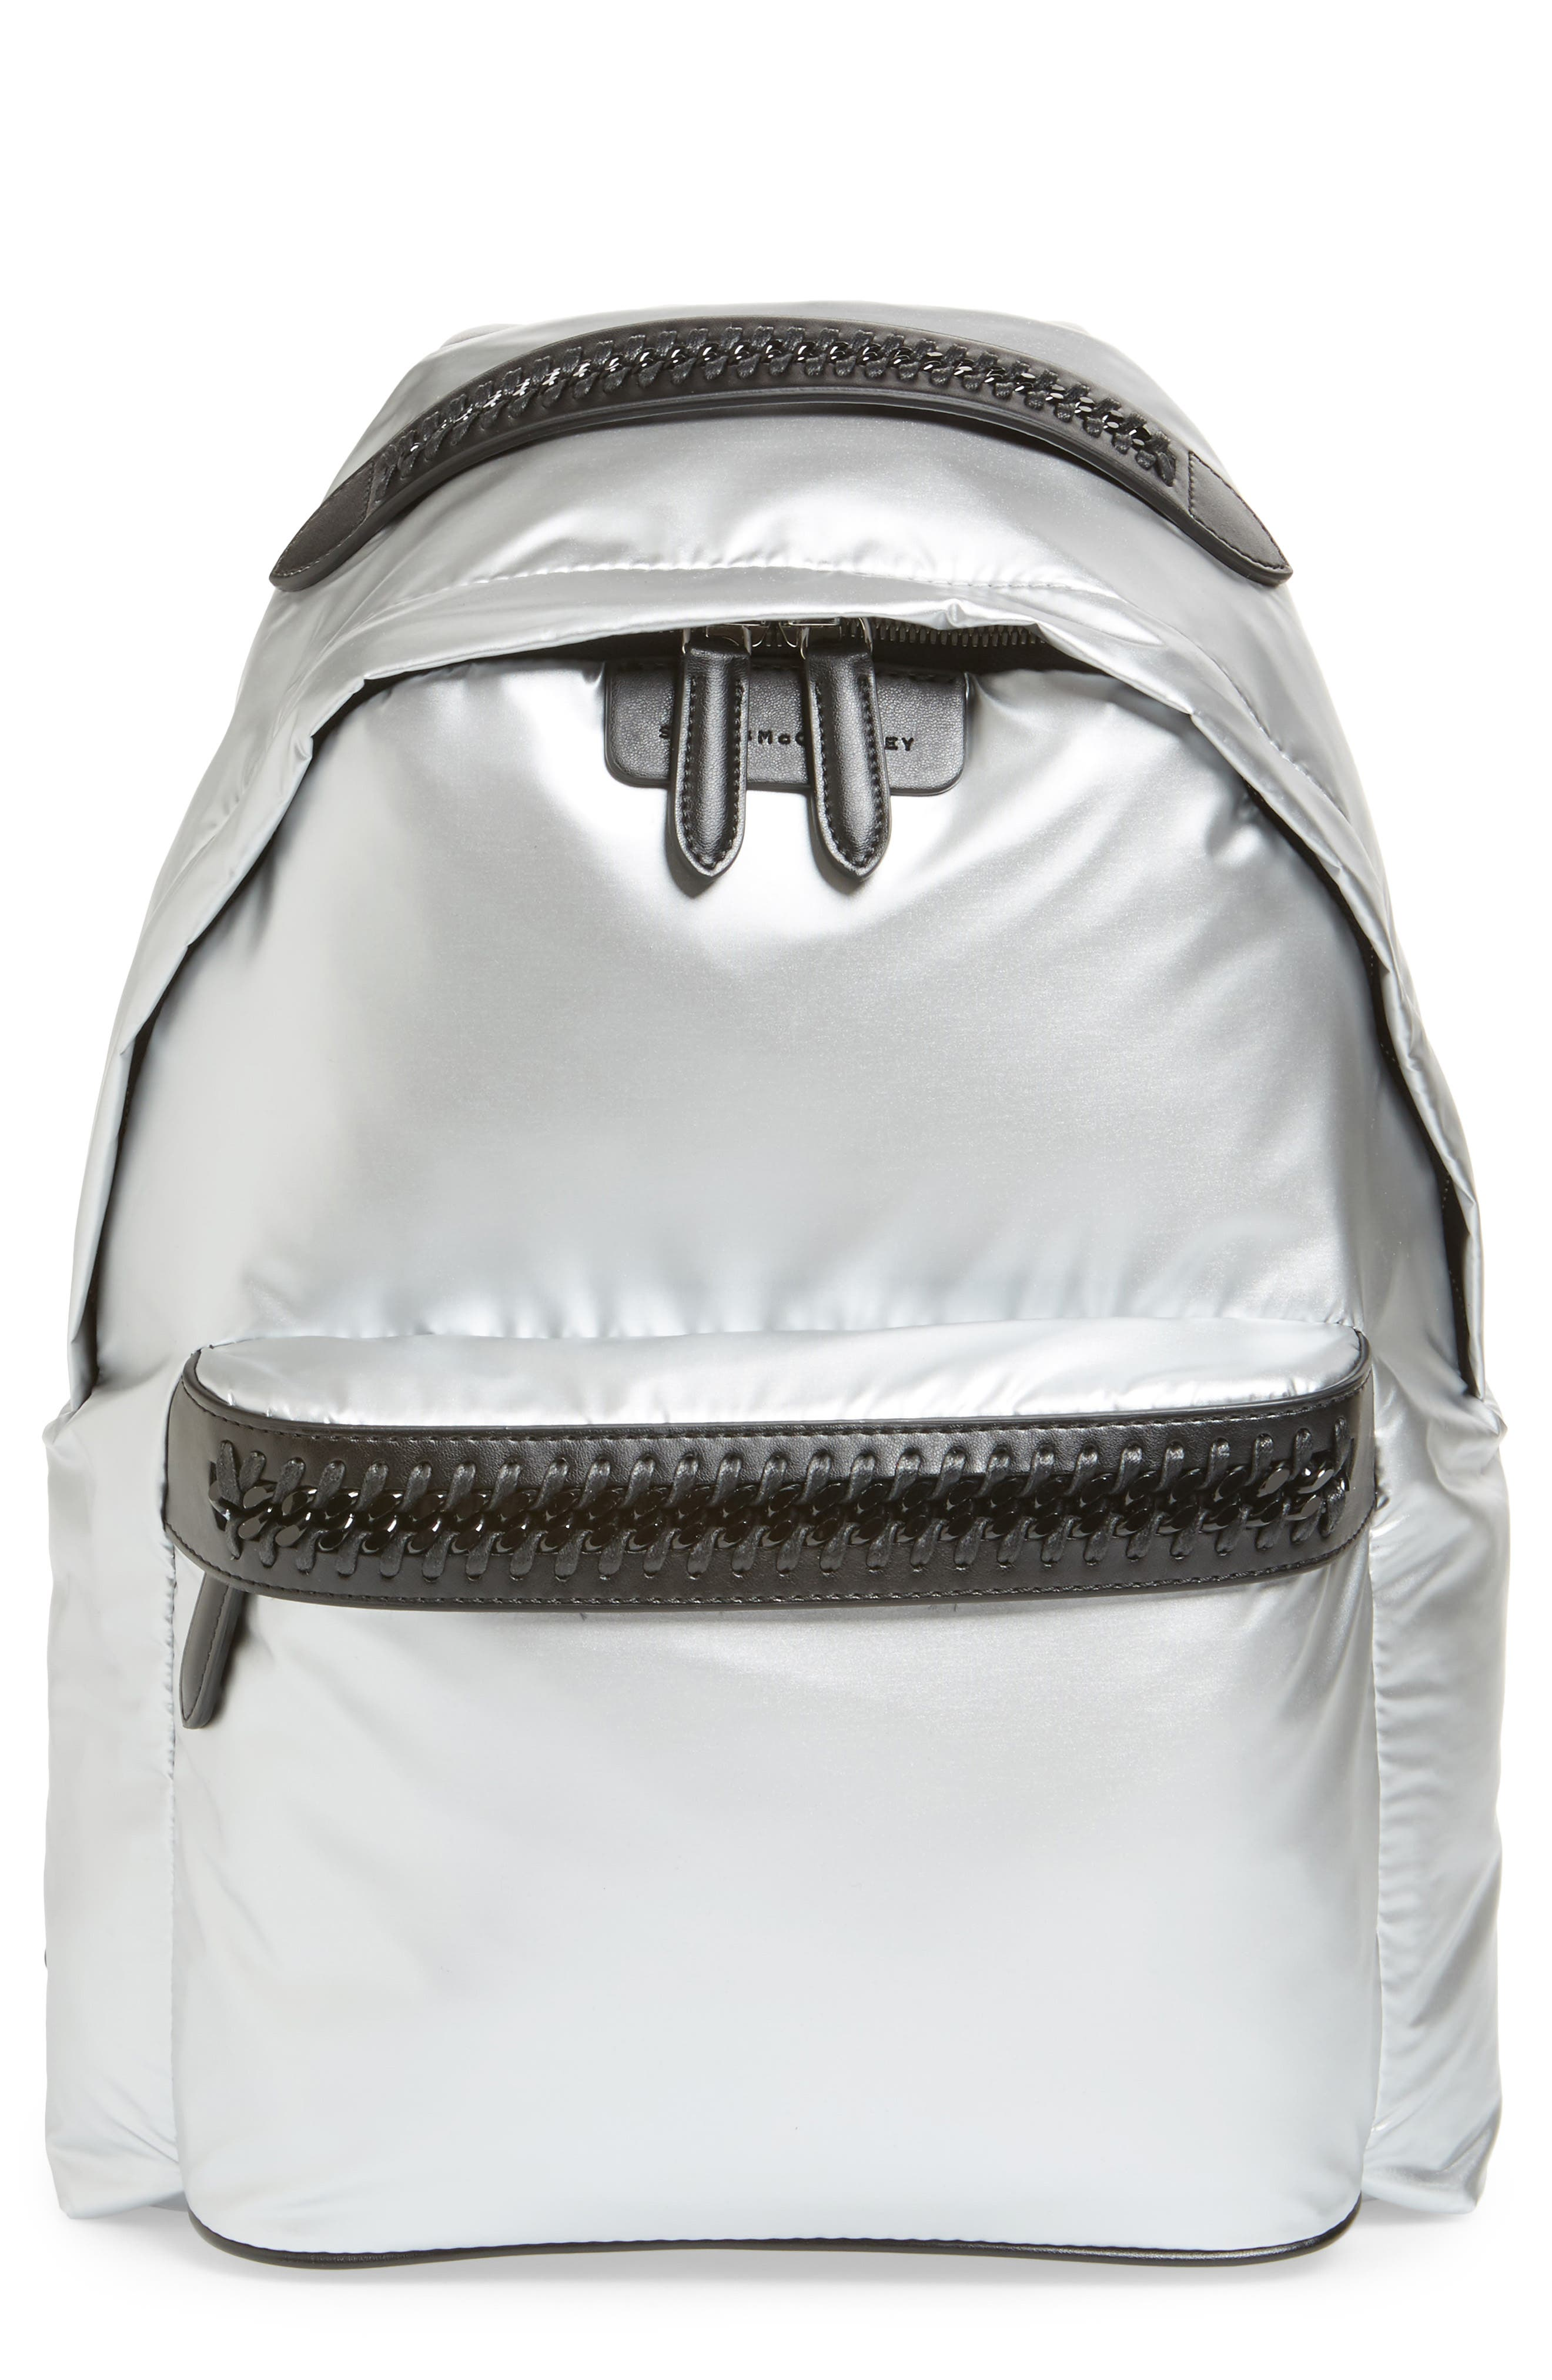 Stella McCartney Falabella Metallic Nylon Backpack